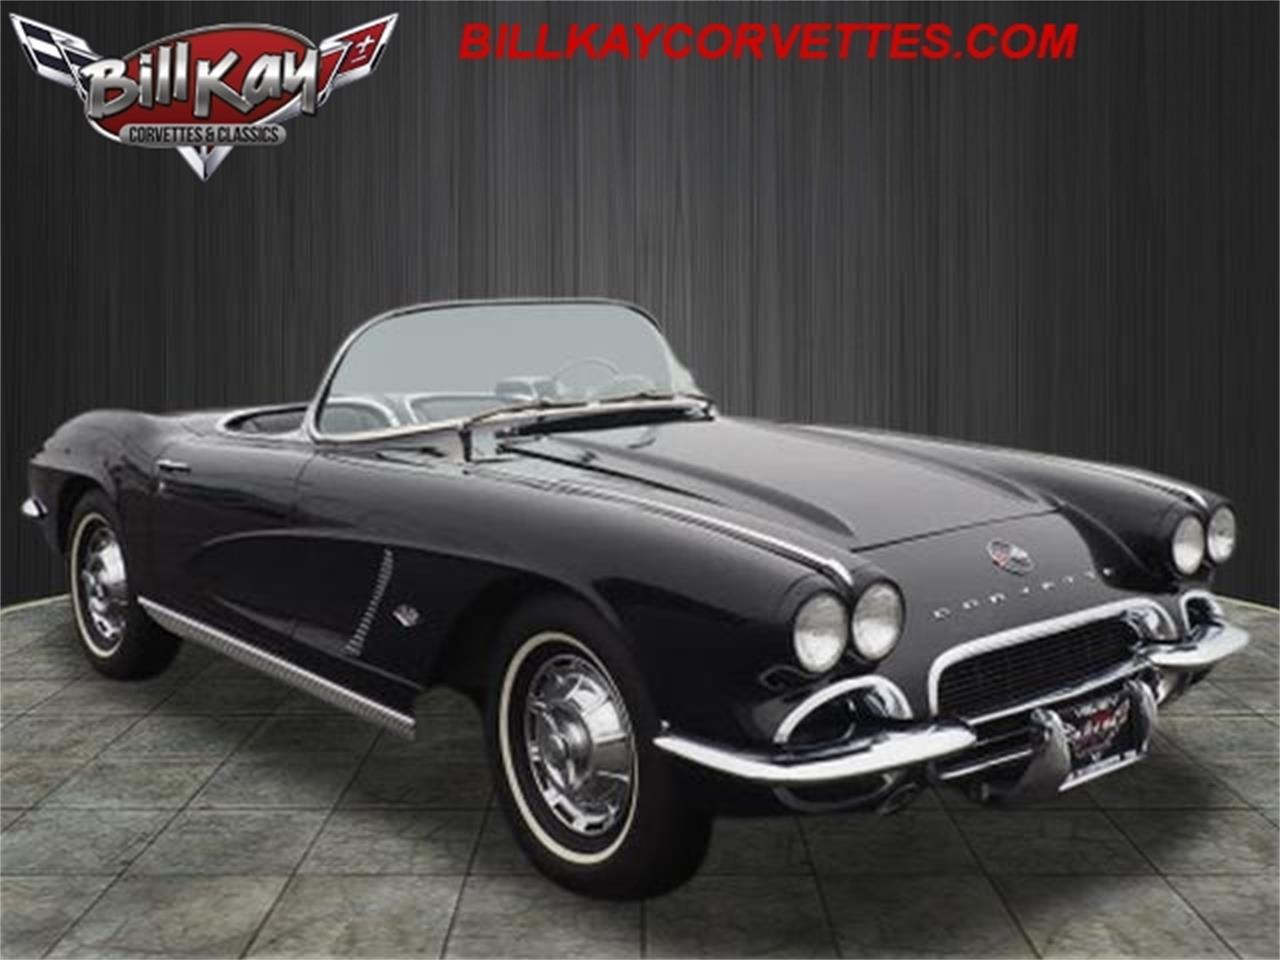 For Sale: 1962 Chevrolet Corvette in Downers Grove, Illinois